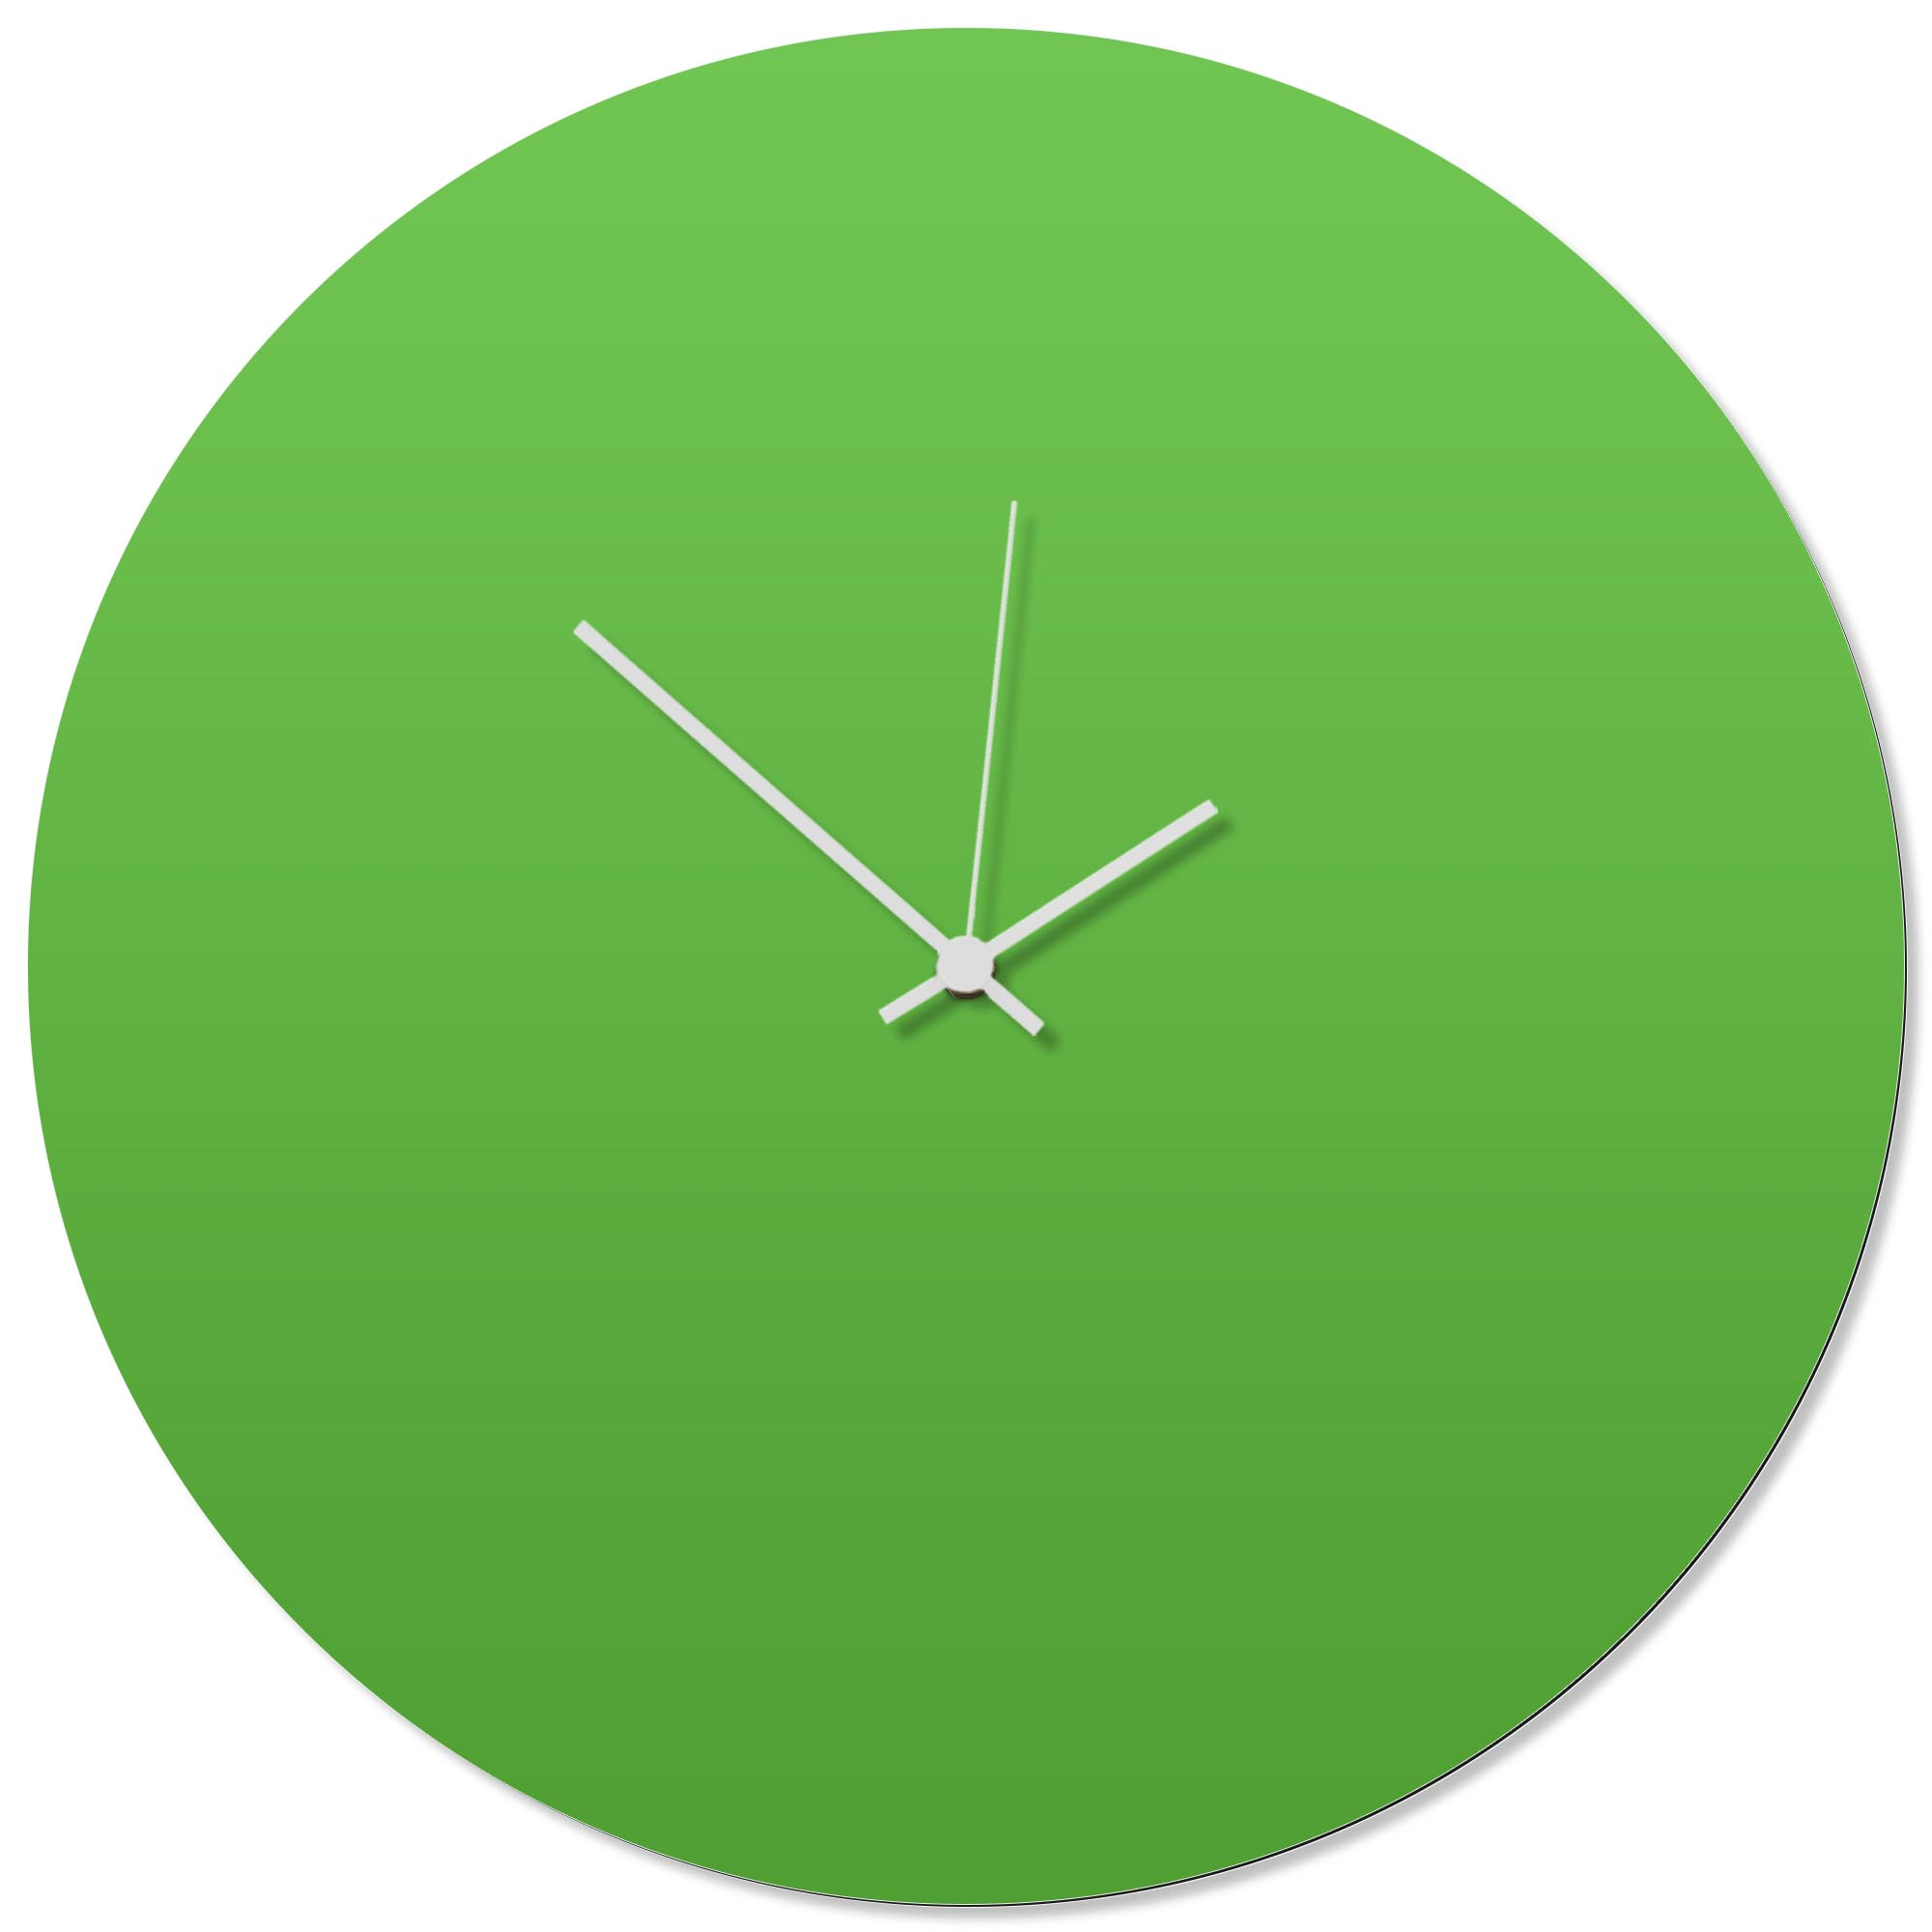 Greenout White Circle Clock Large 23x23in. Aluminum Polymetal